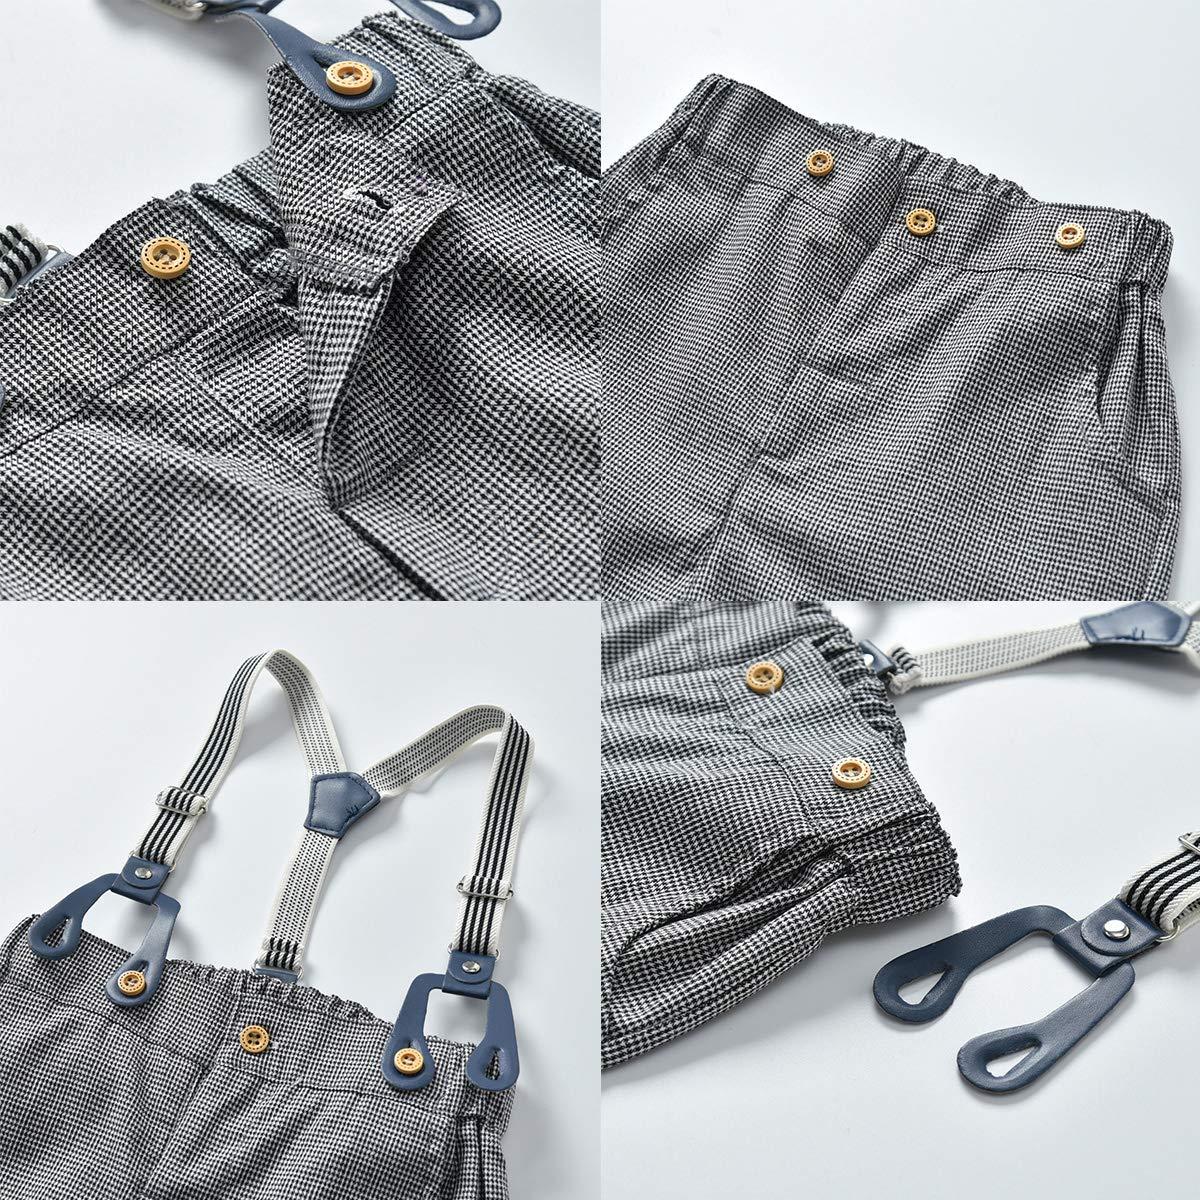 Suspender Pants Outfits Set Kids Toddler Boys Gentlemen Suit Long Sleeve Bow Tie Shirt